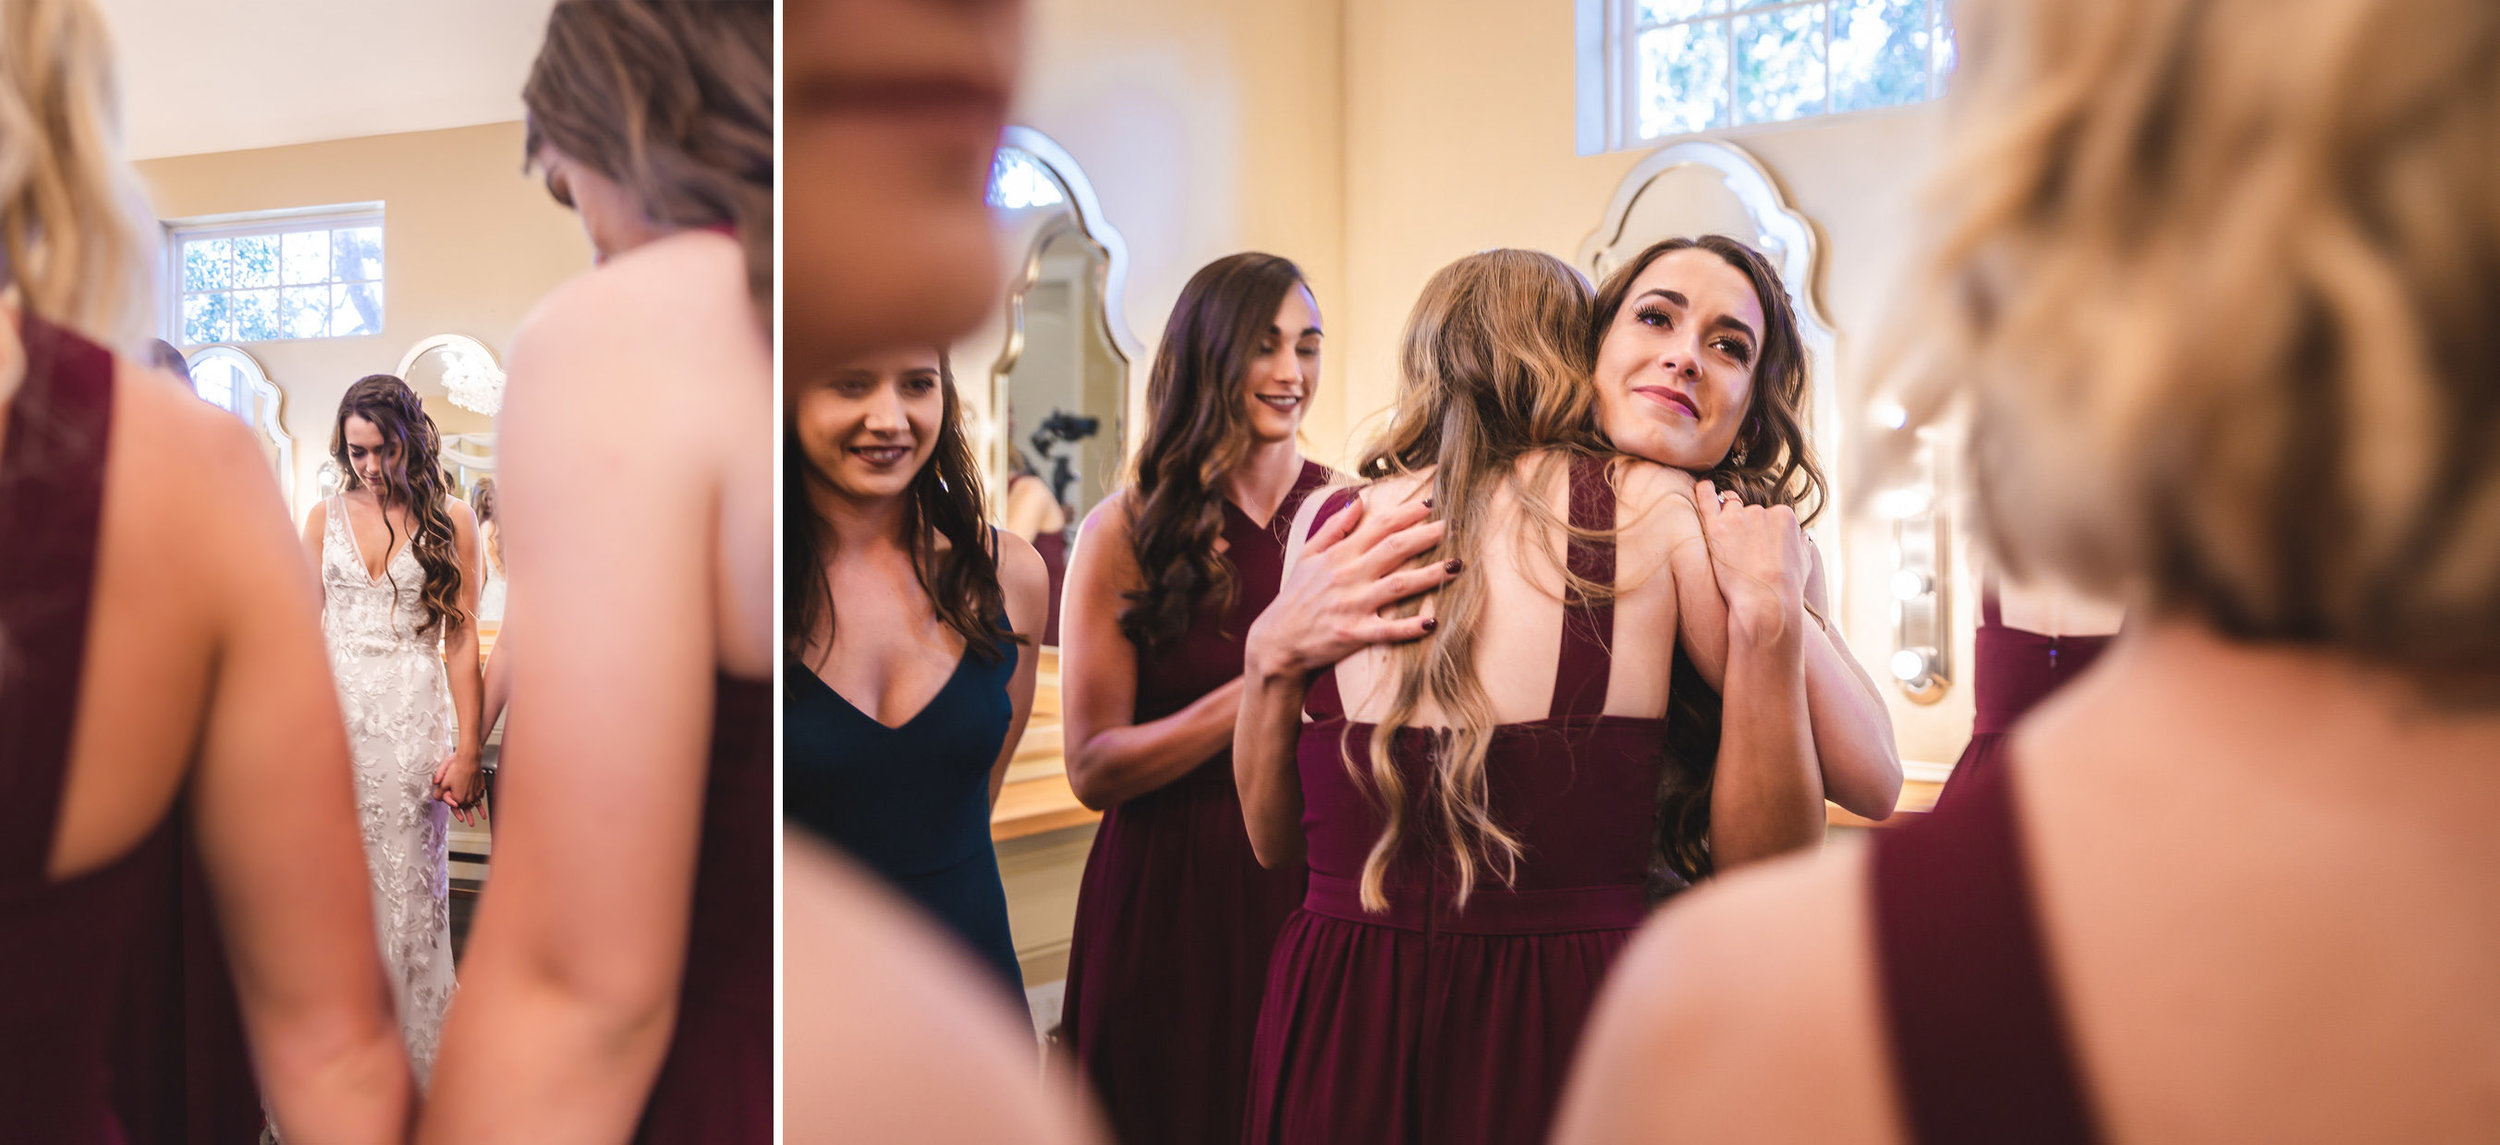 adam-szarmack-bowing-oaks-wedding-photographer-jacksonville-47.jpg